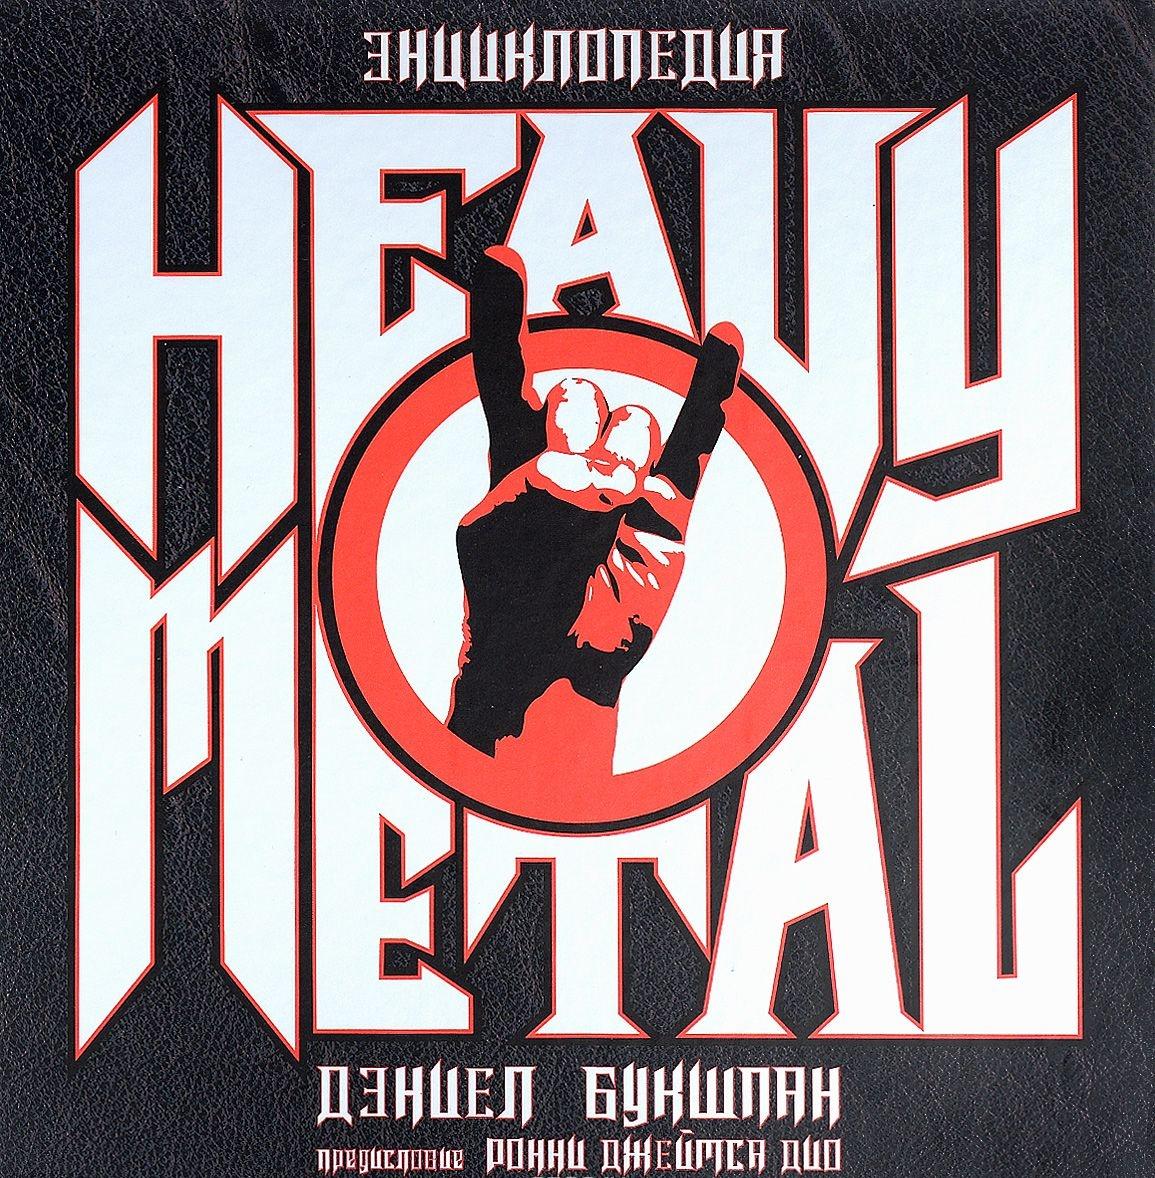 Купить Энциклопедия Heavy Metal, Дэниел Букшпан, 978-5-17-081039-0